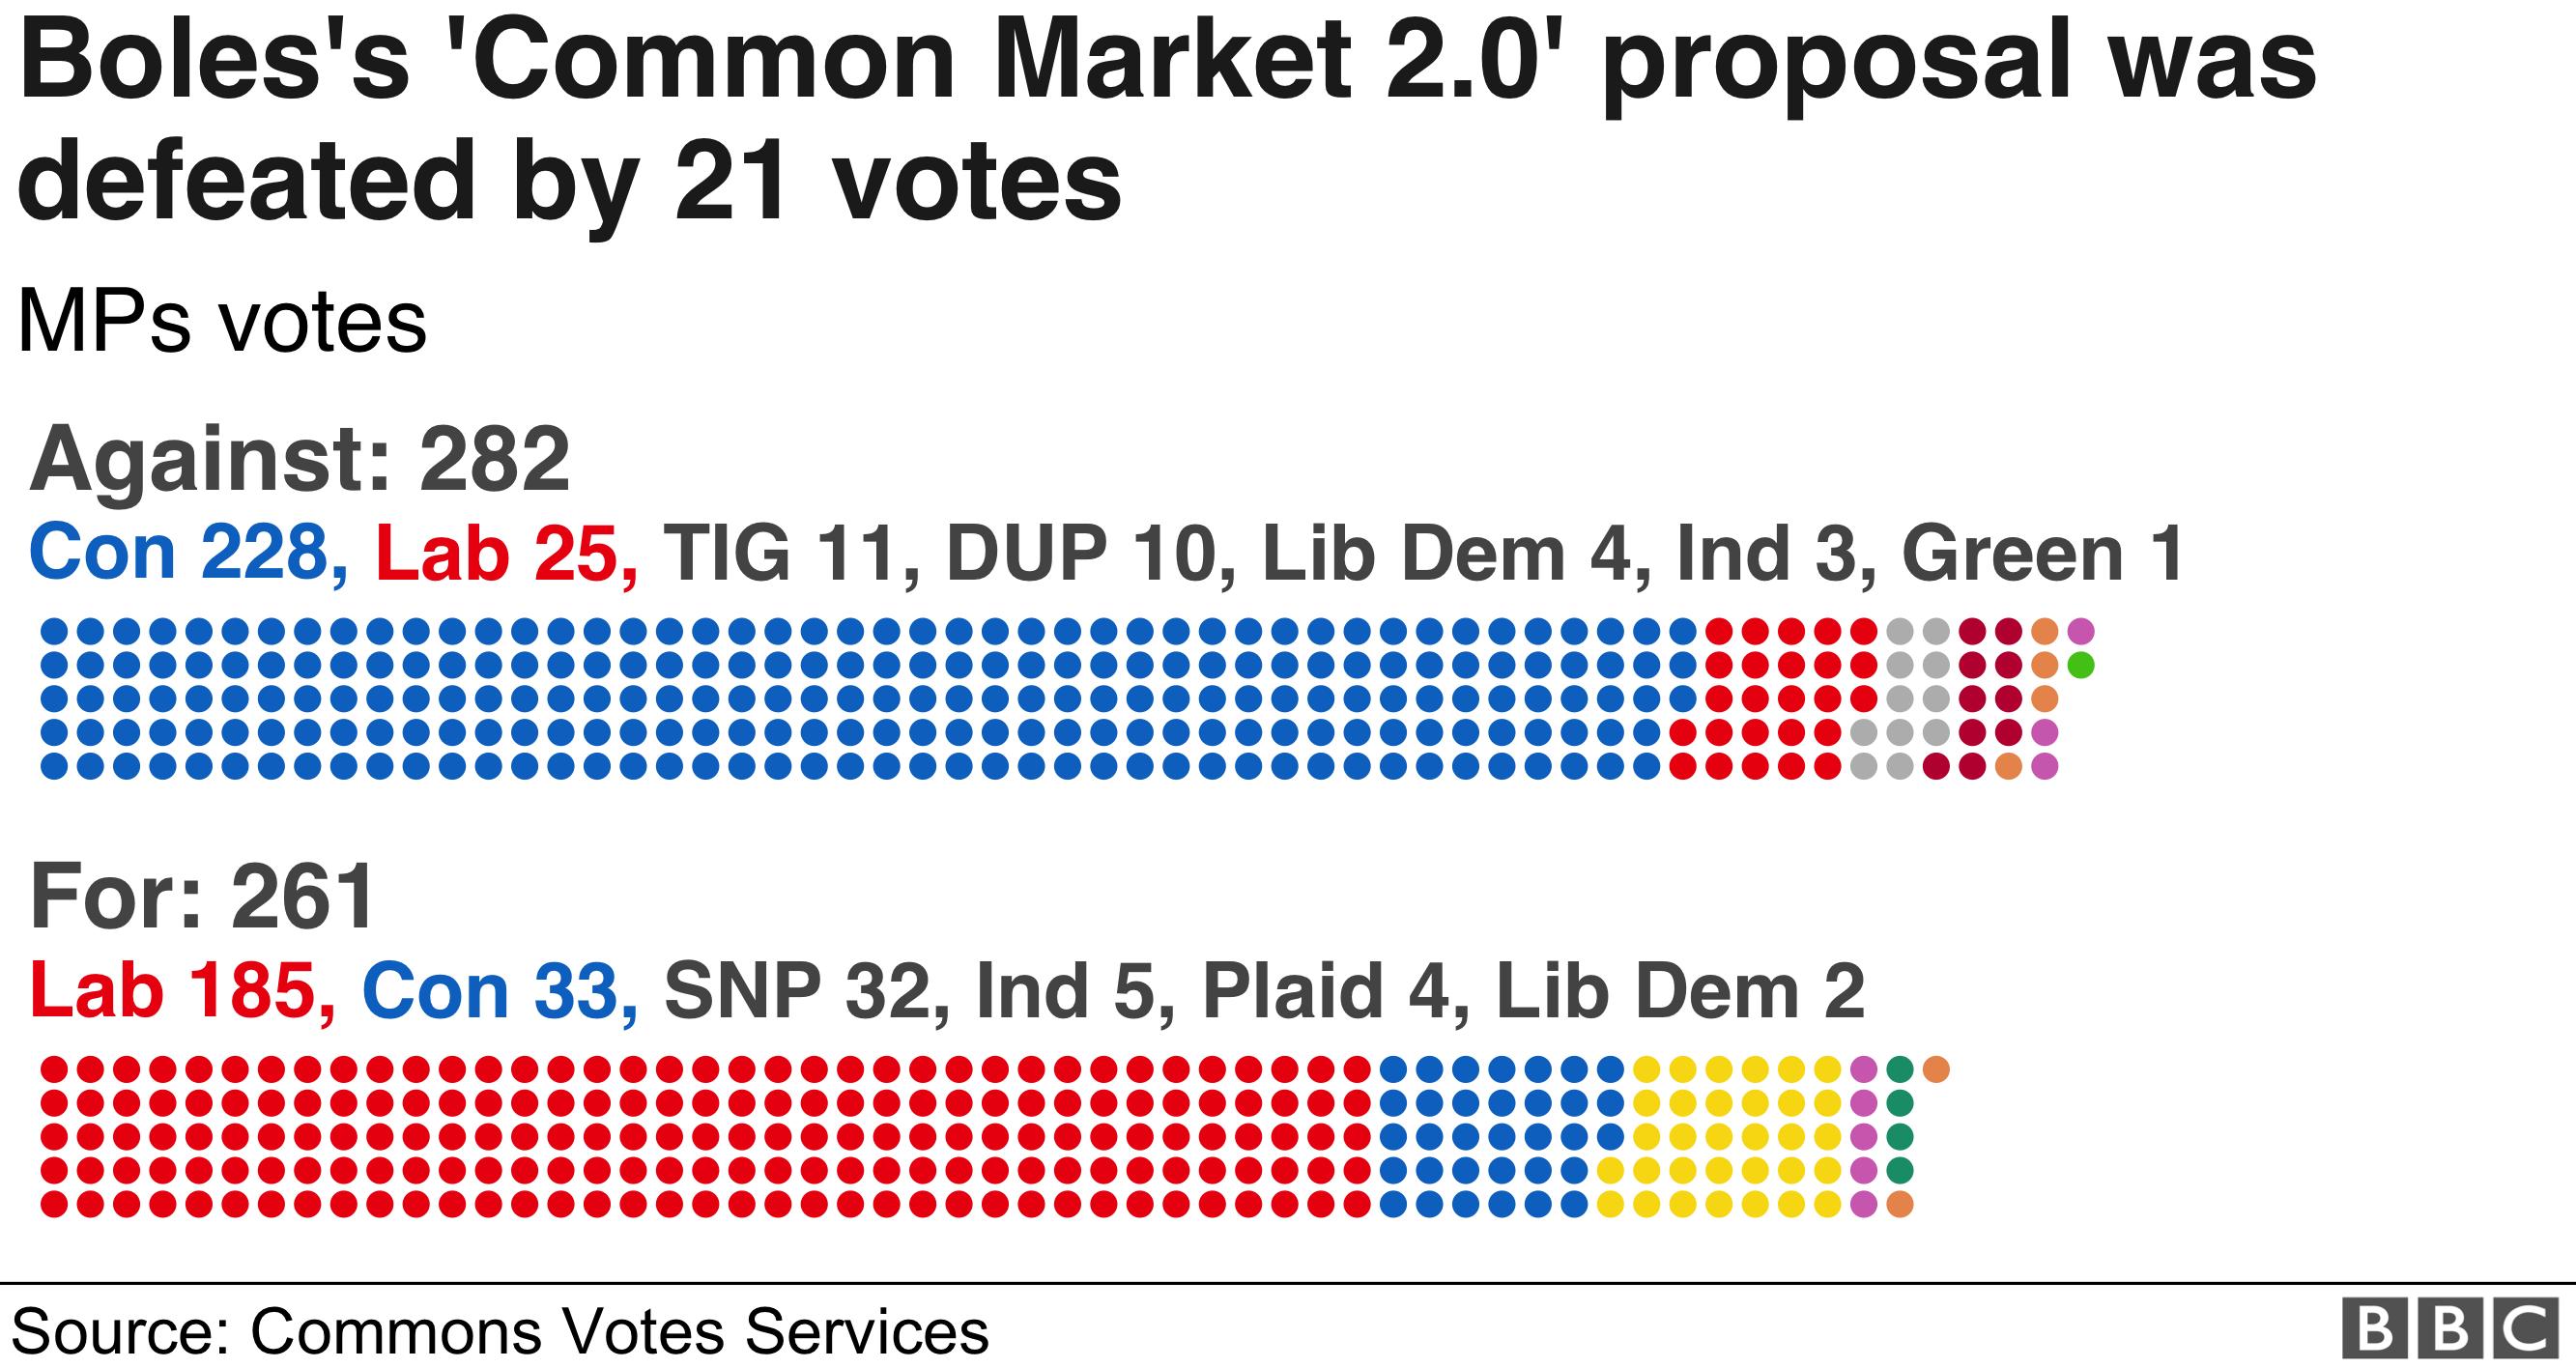 Graphic of Common Market 2.0 vote